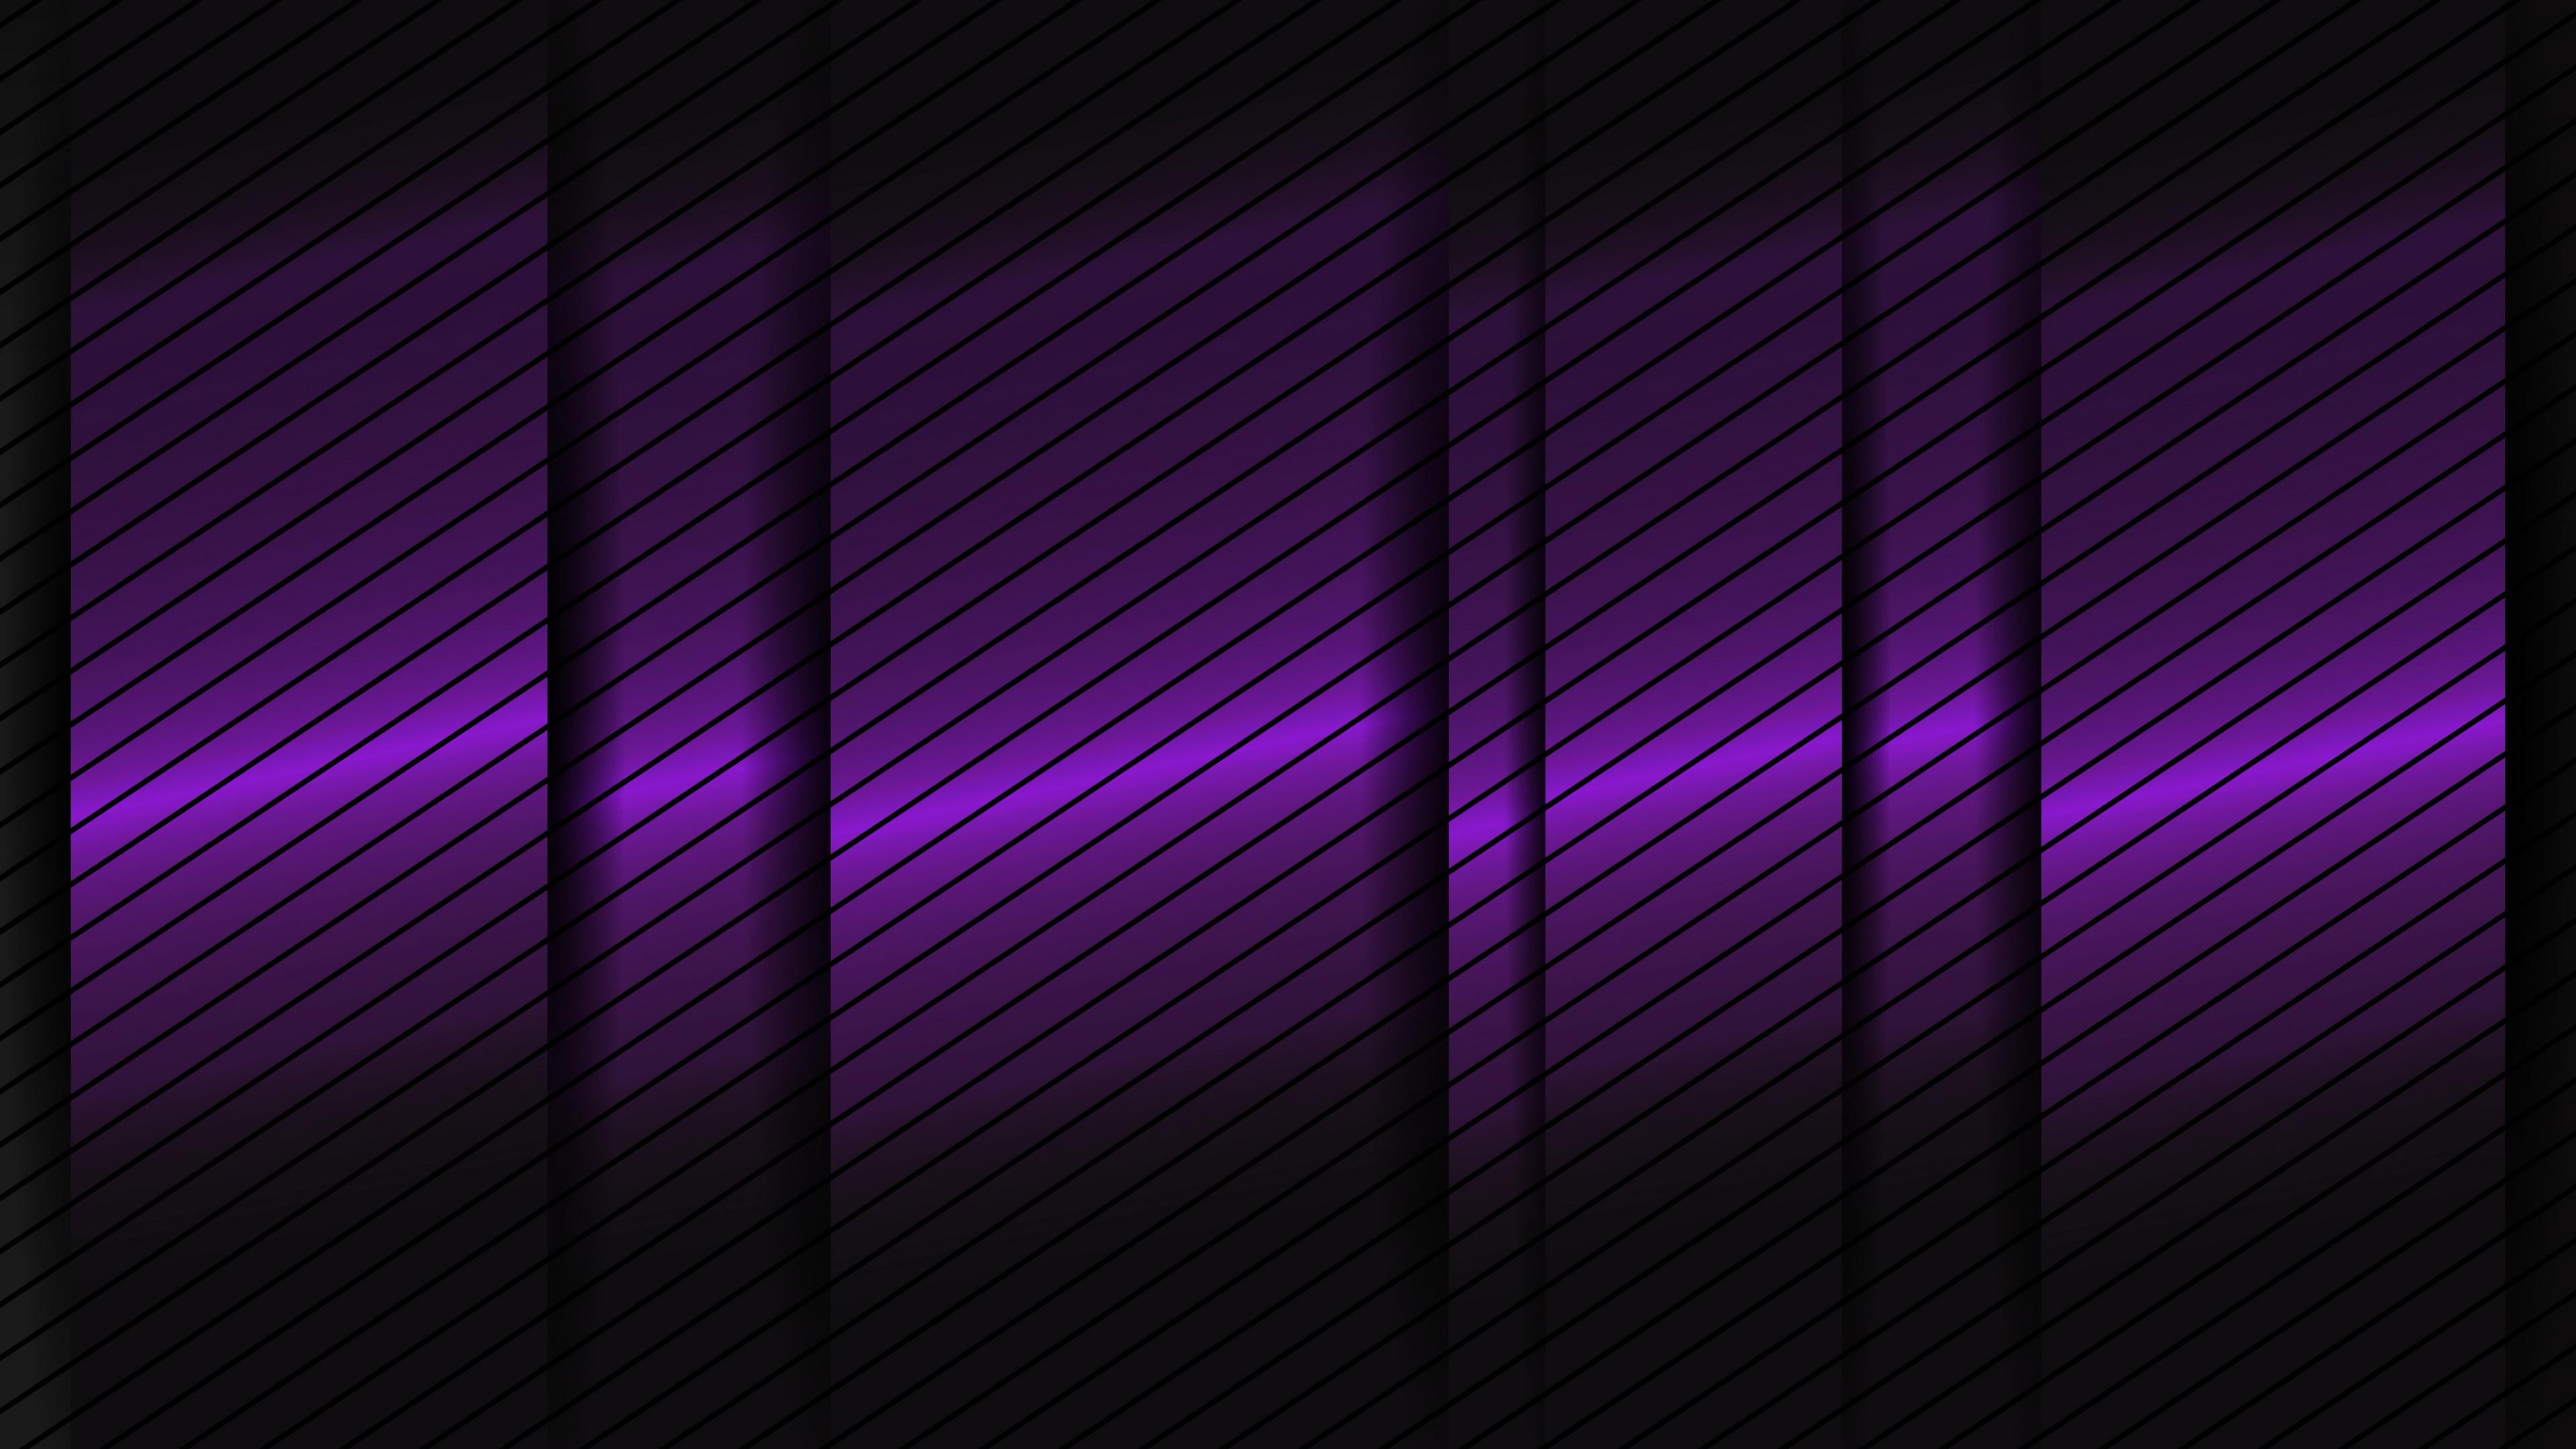 purple lines abstract 1539370692 - Purple Lines Abstract - purple wallpapers, lines wallpapers, artist wallpapers, abstract wallpapers